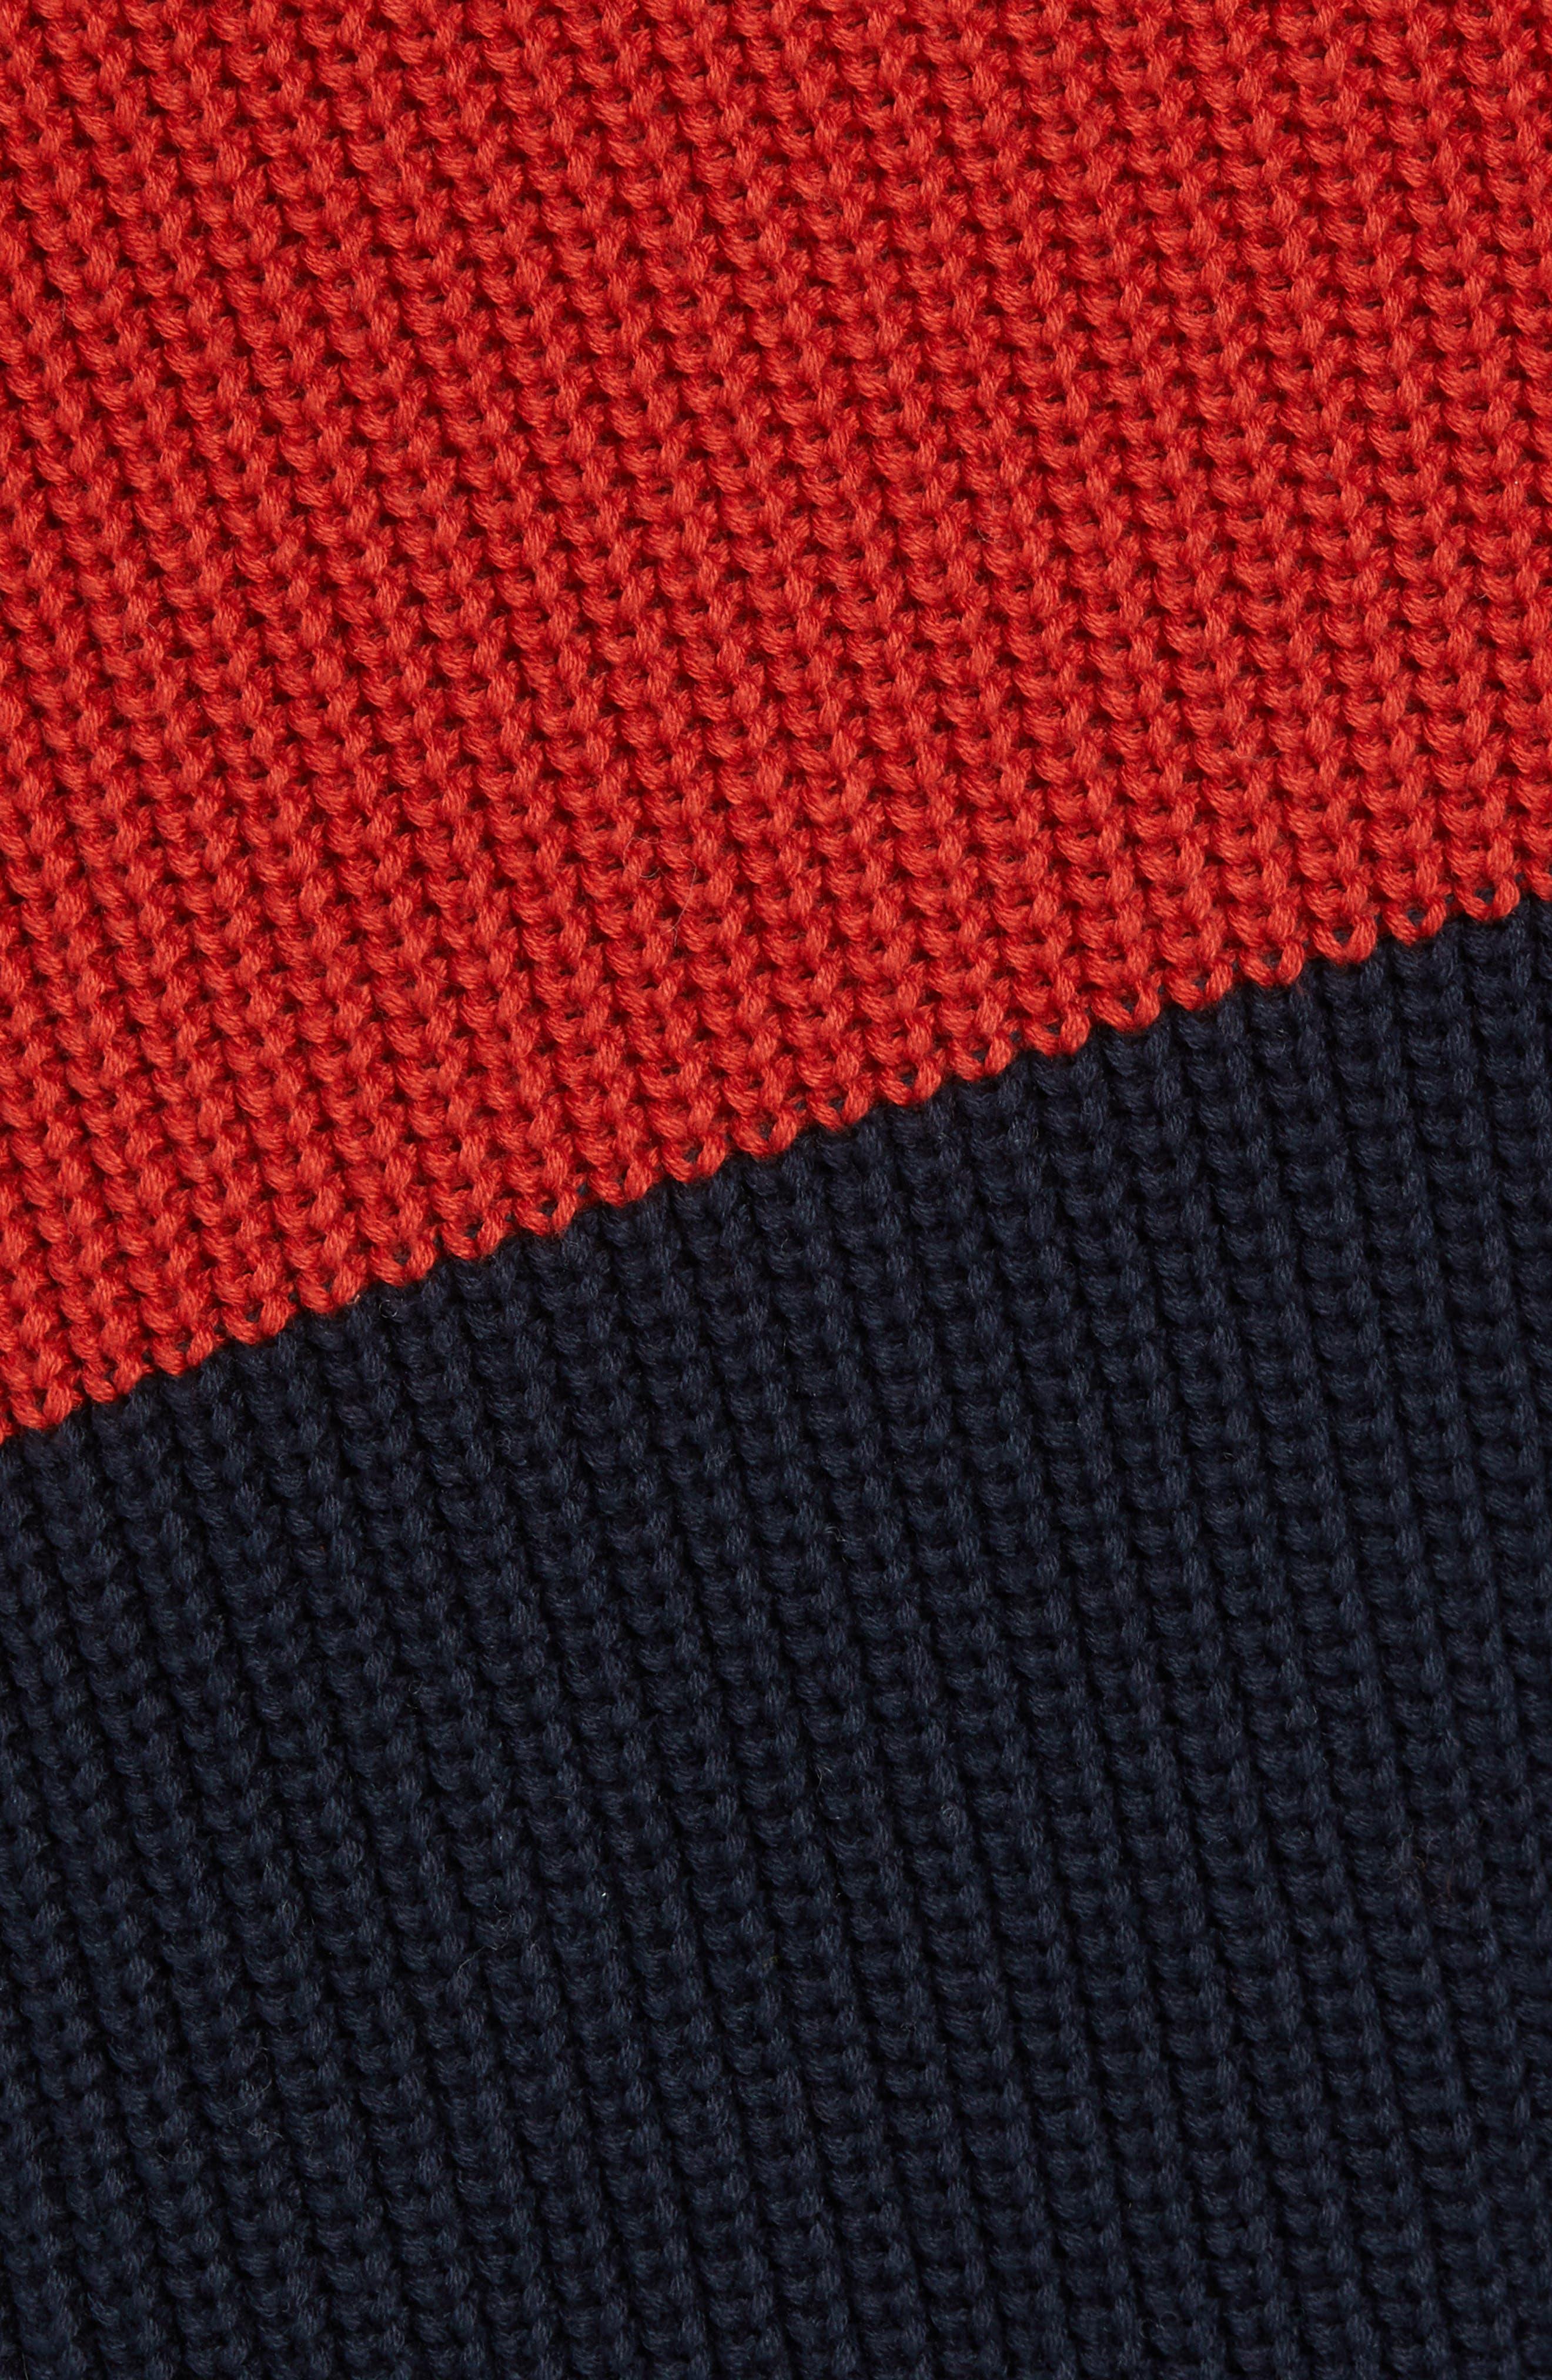 Asymmetrical Colorblock Sweater,                             Alternate thumbnail 5, color,                             ROOIBOS TEA